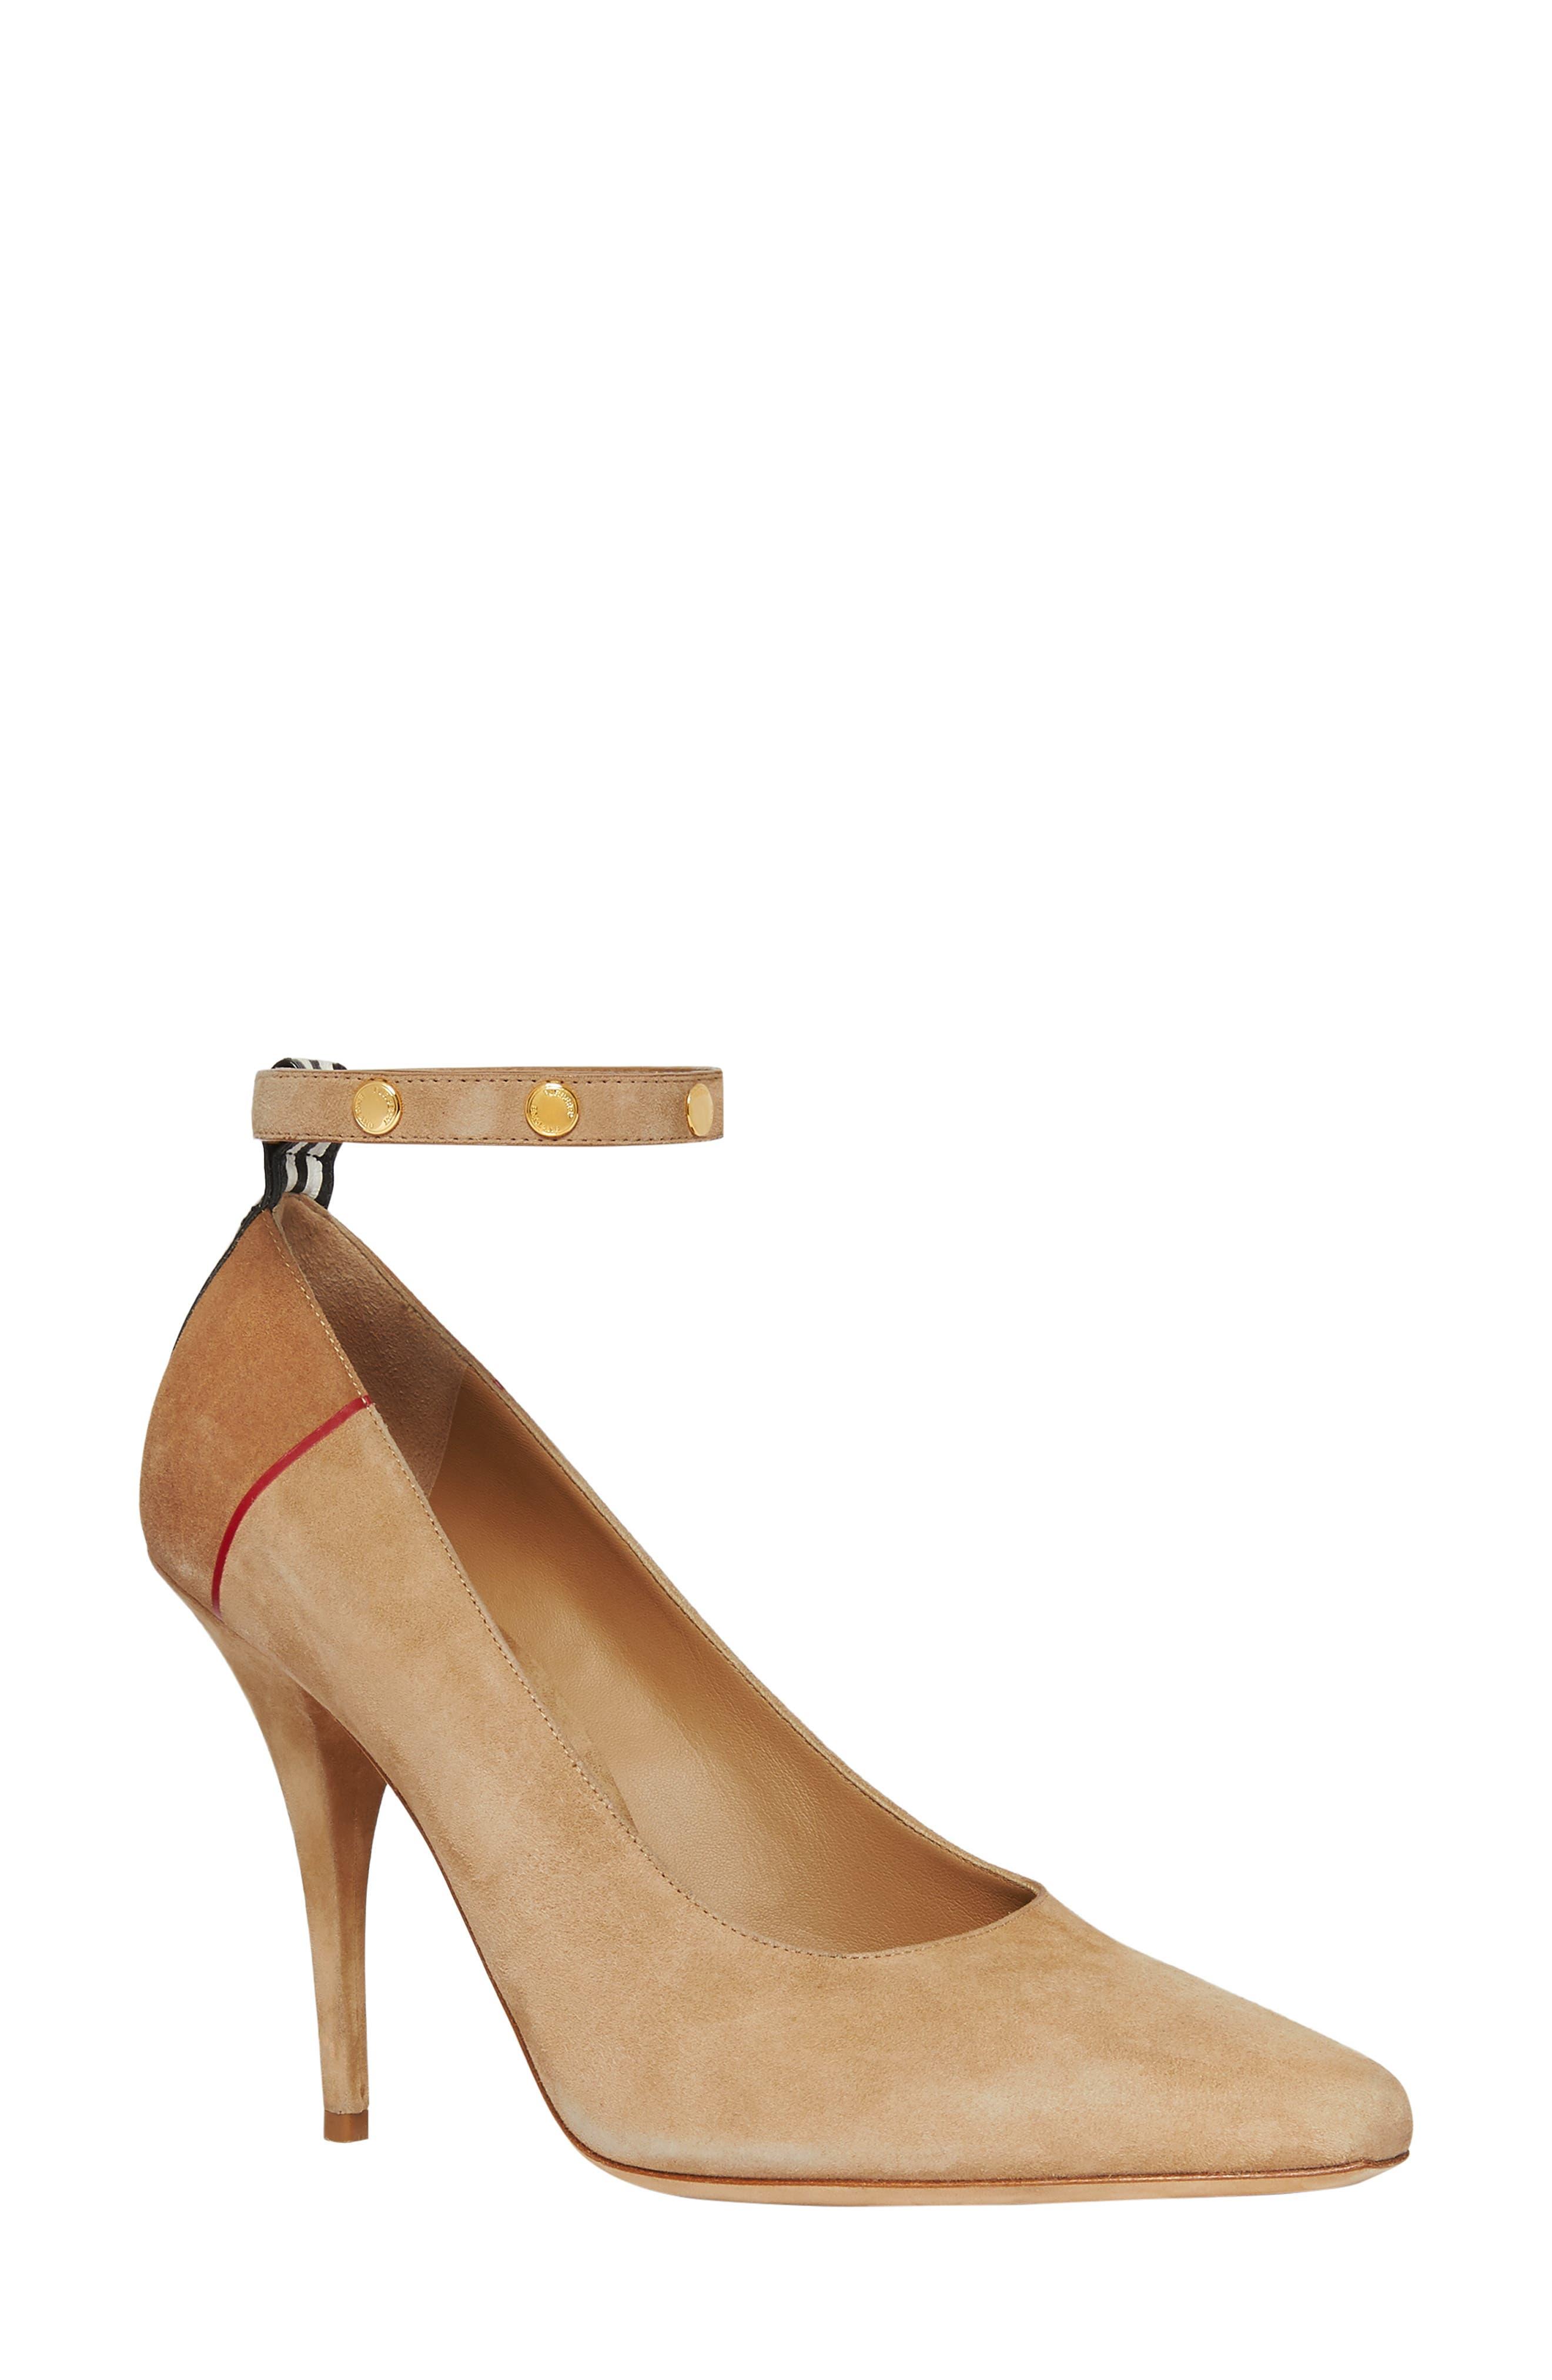 Burberry Kiton Ankle Strap Pump, Brown